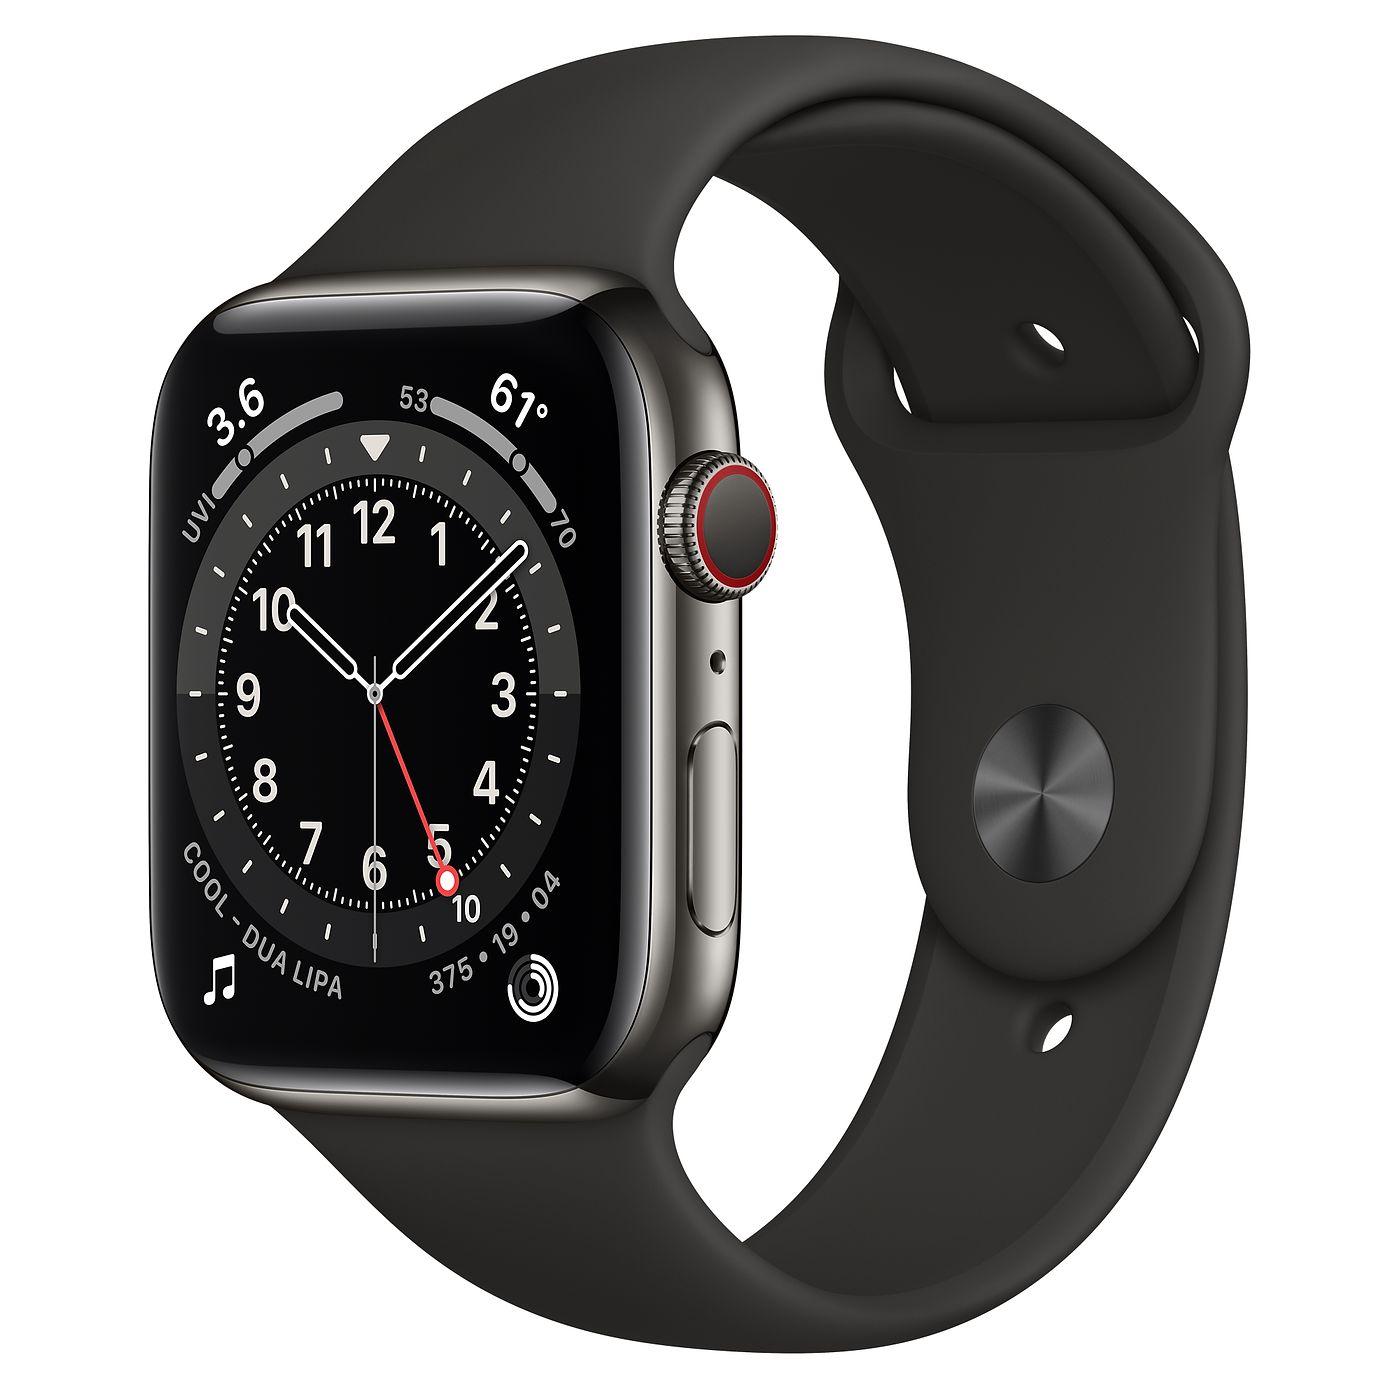 Apple 2020년 애플워치 6, GPS+Cellular, 그래파이트 스테인리스 스틸 케이스, 블랙 스포츠 밴드